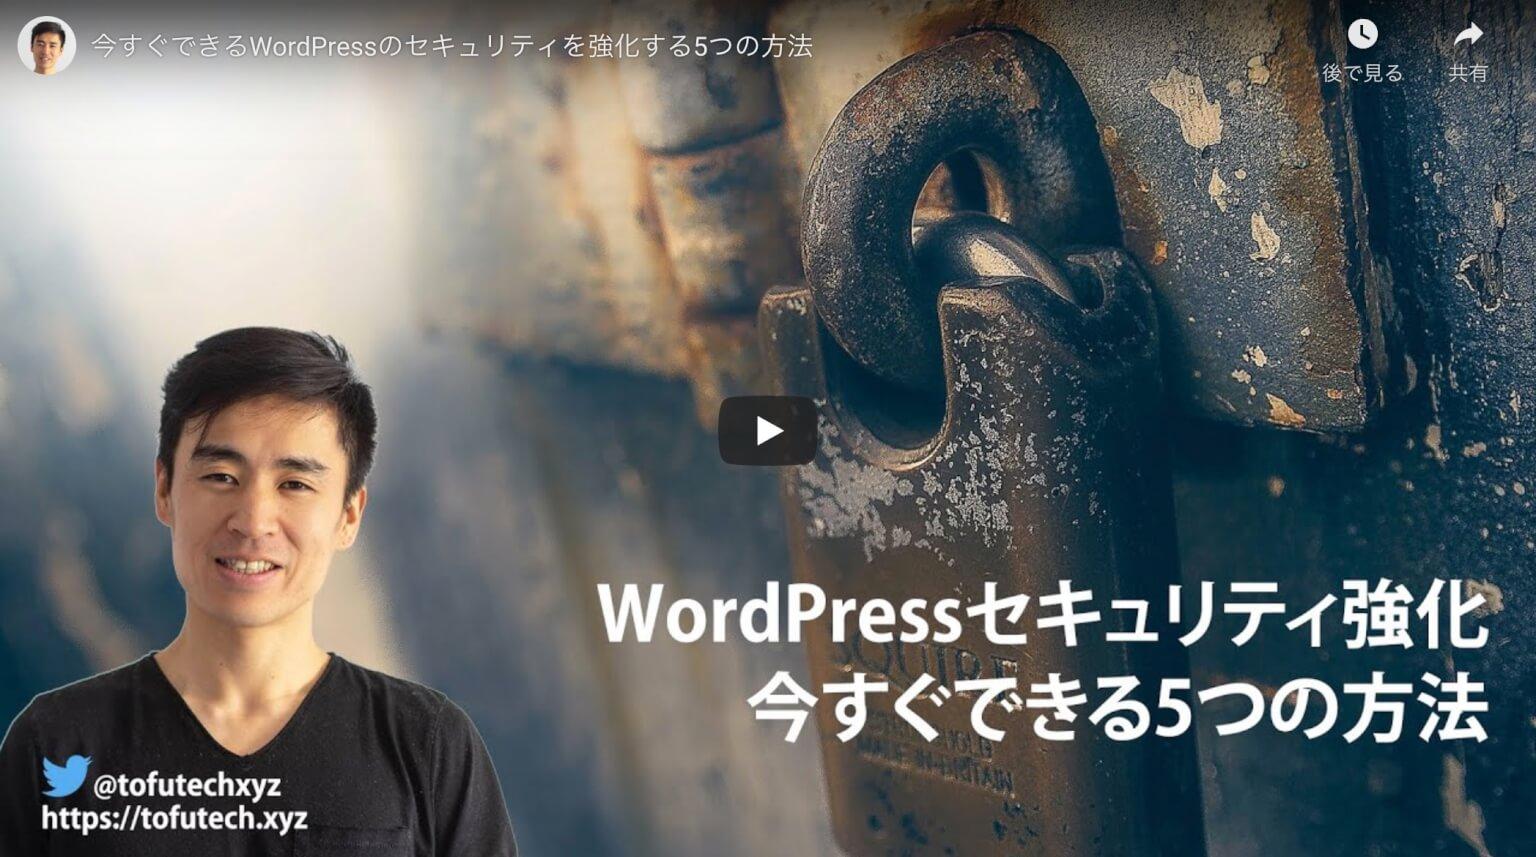 WordPressのセキュリティを強化する5つの方法